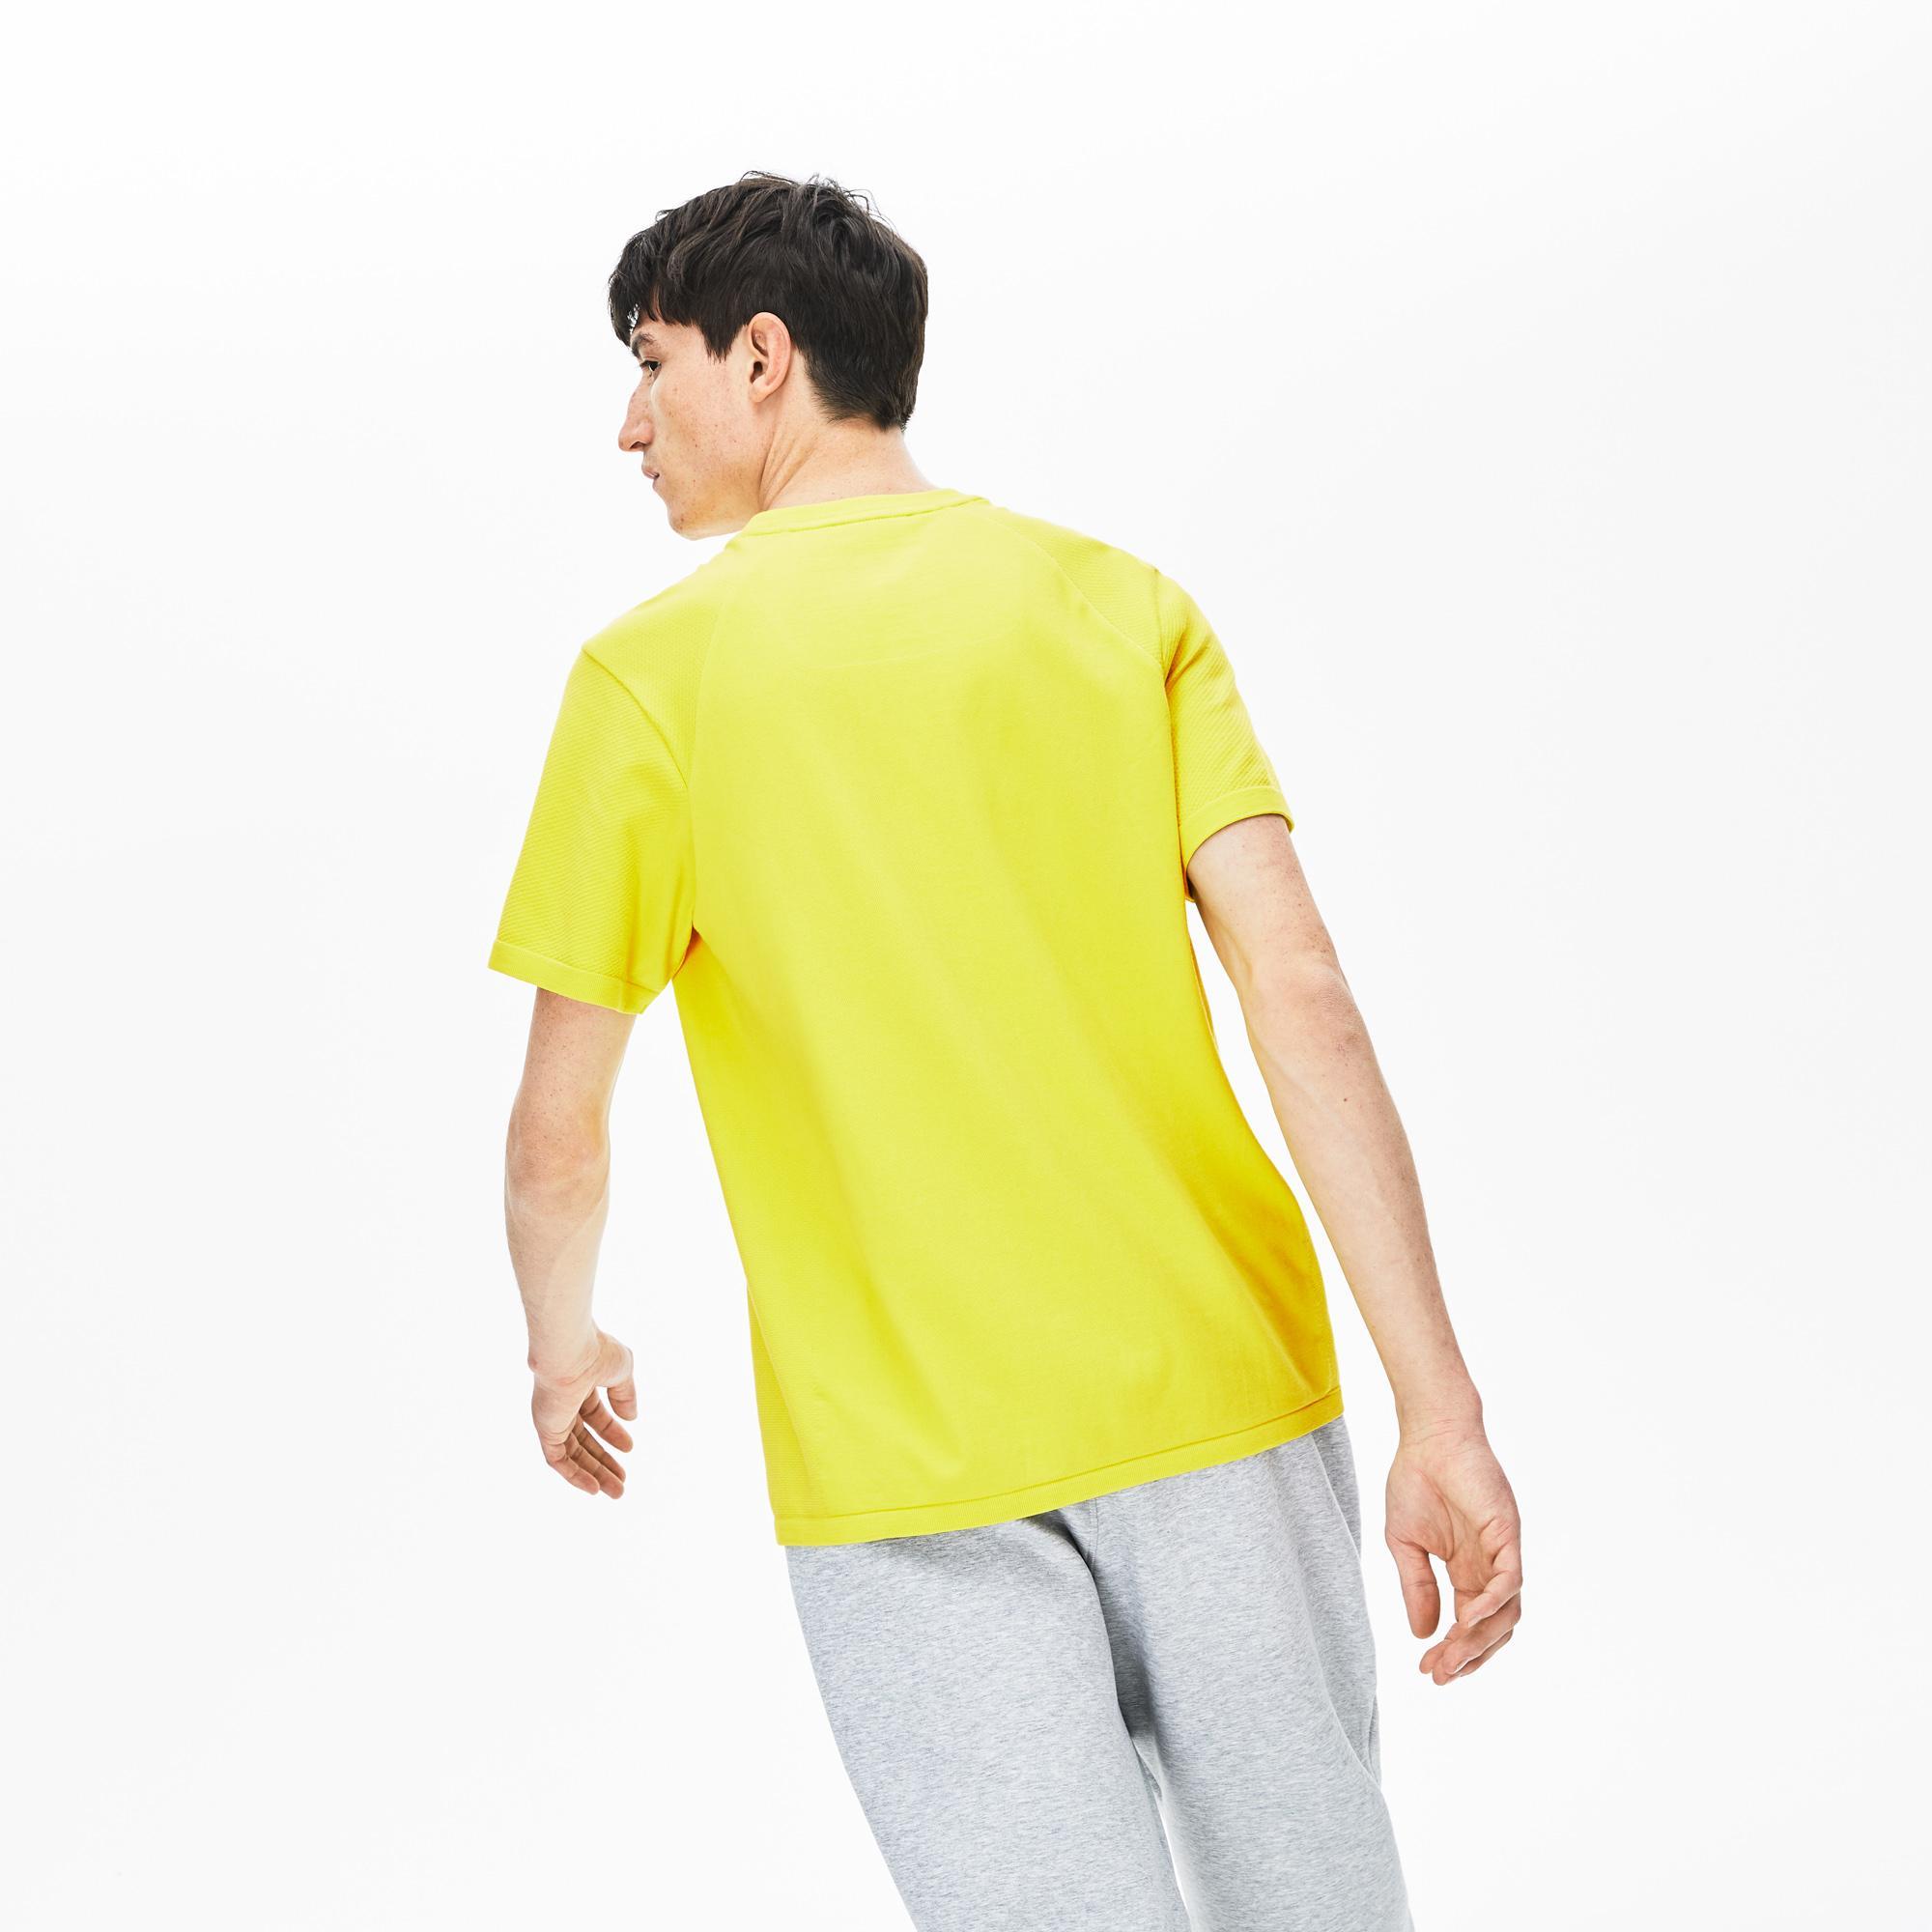 Lacoste Motion Erkek Slim Fit Sarı T-Shirt